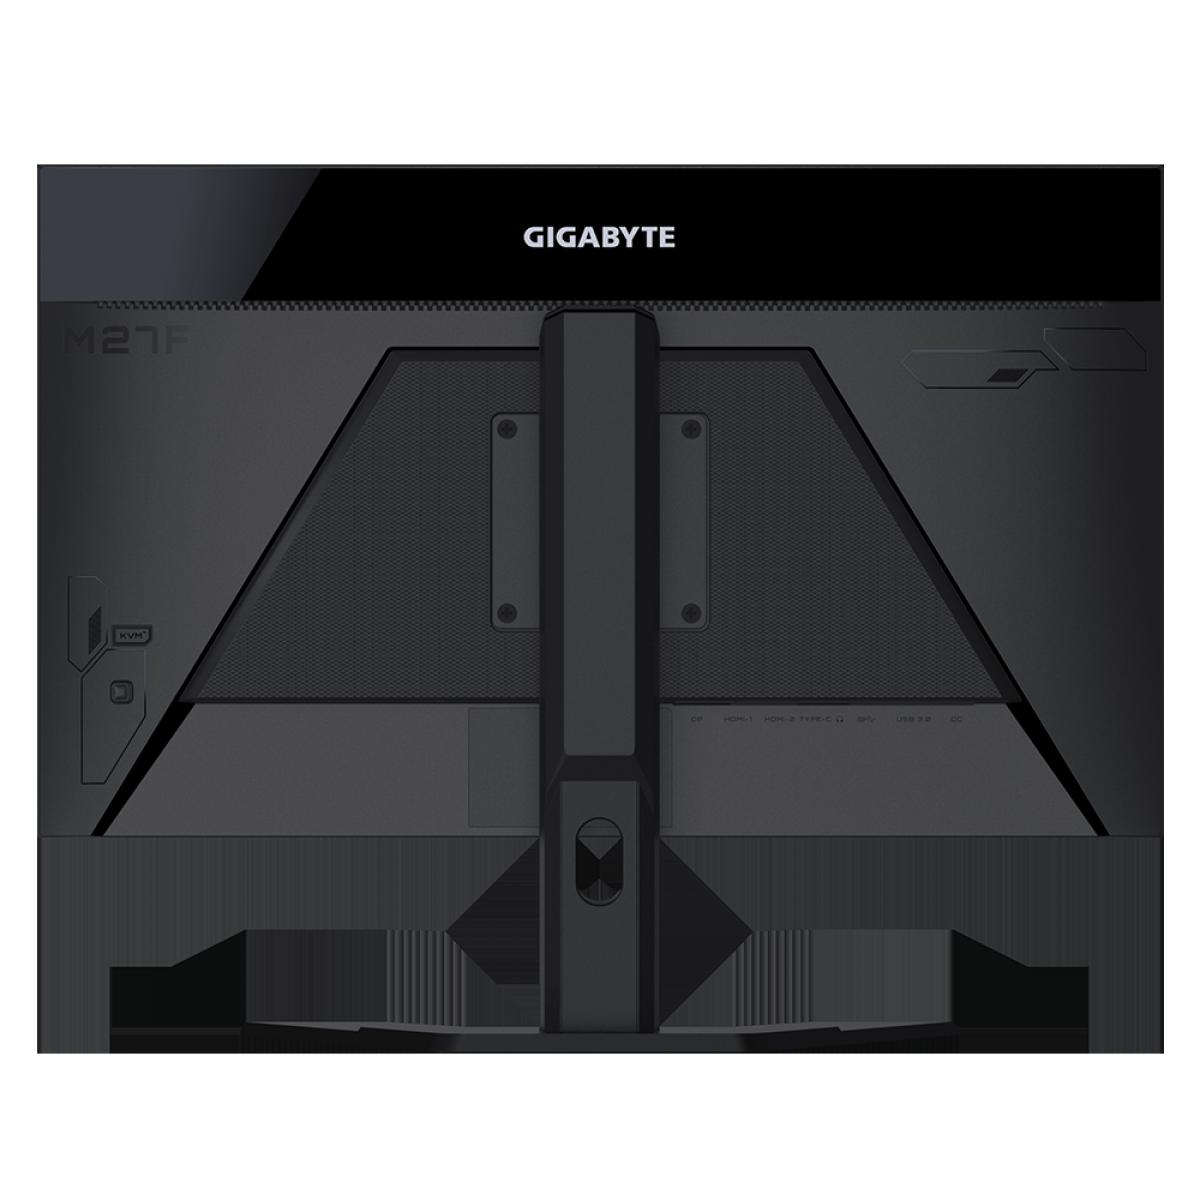 Monitor Gamer Gigabyte M27F, 27 Pol, FullHD, 144Hz, 1ms, IPS, KVM, FreeSync, HDR, DP/HDMIx2, 20VM0-M27FBA-1SAR